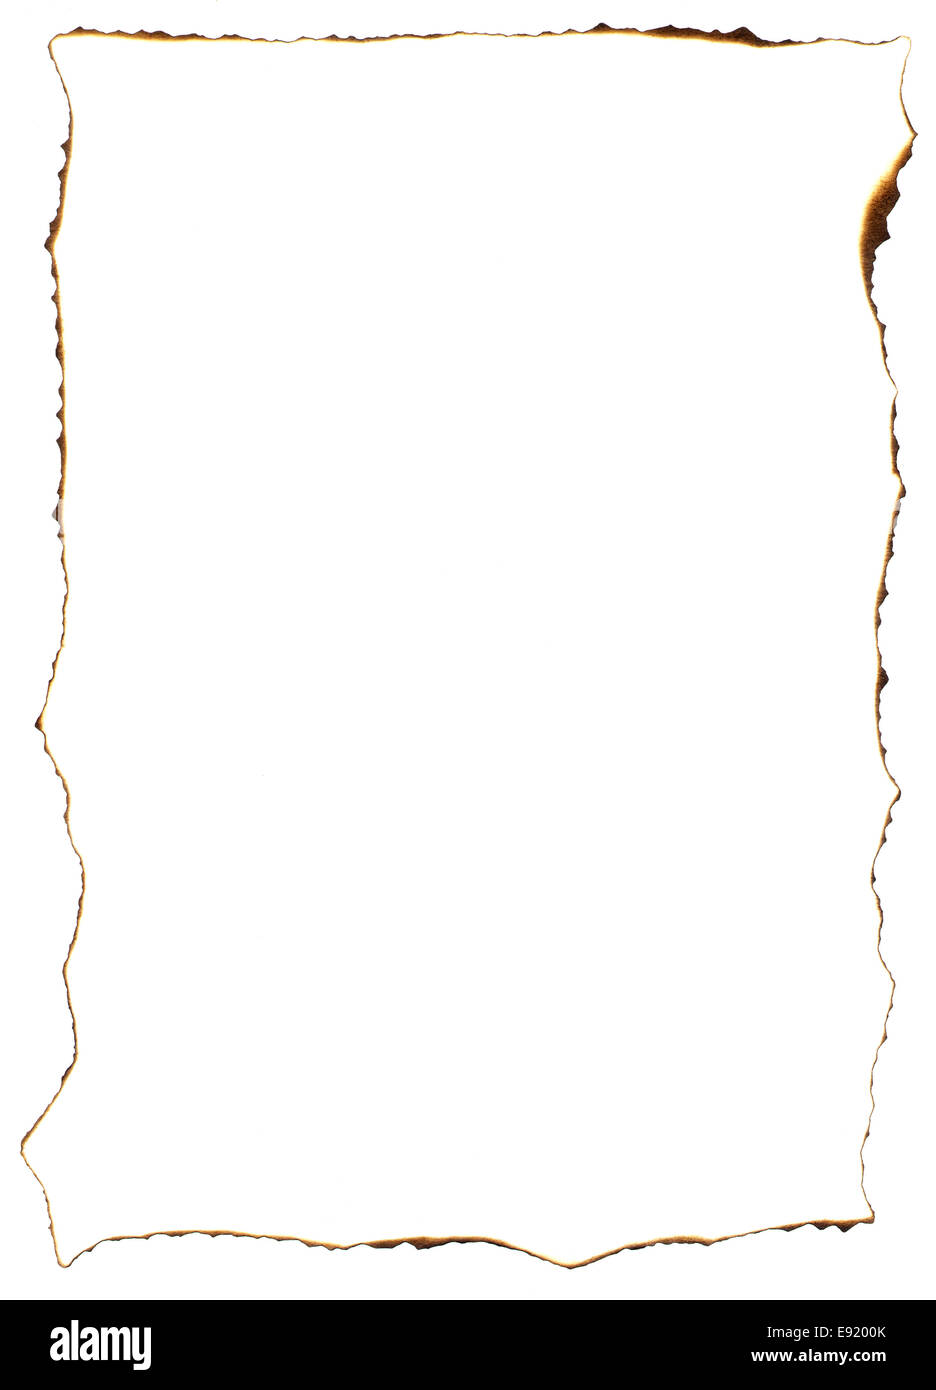 Frame of burnt edges on old paper sheet - Stock Image